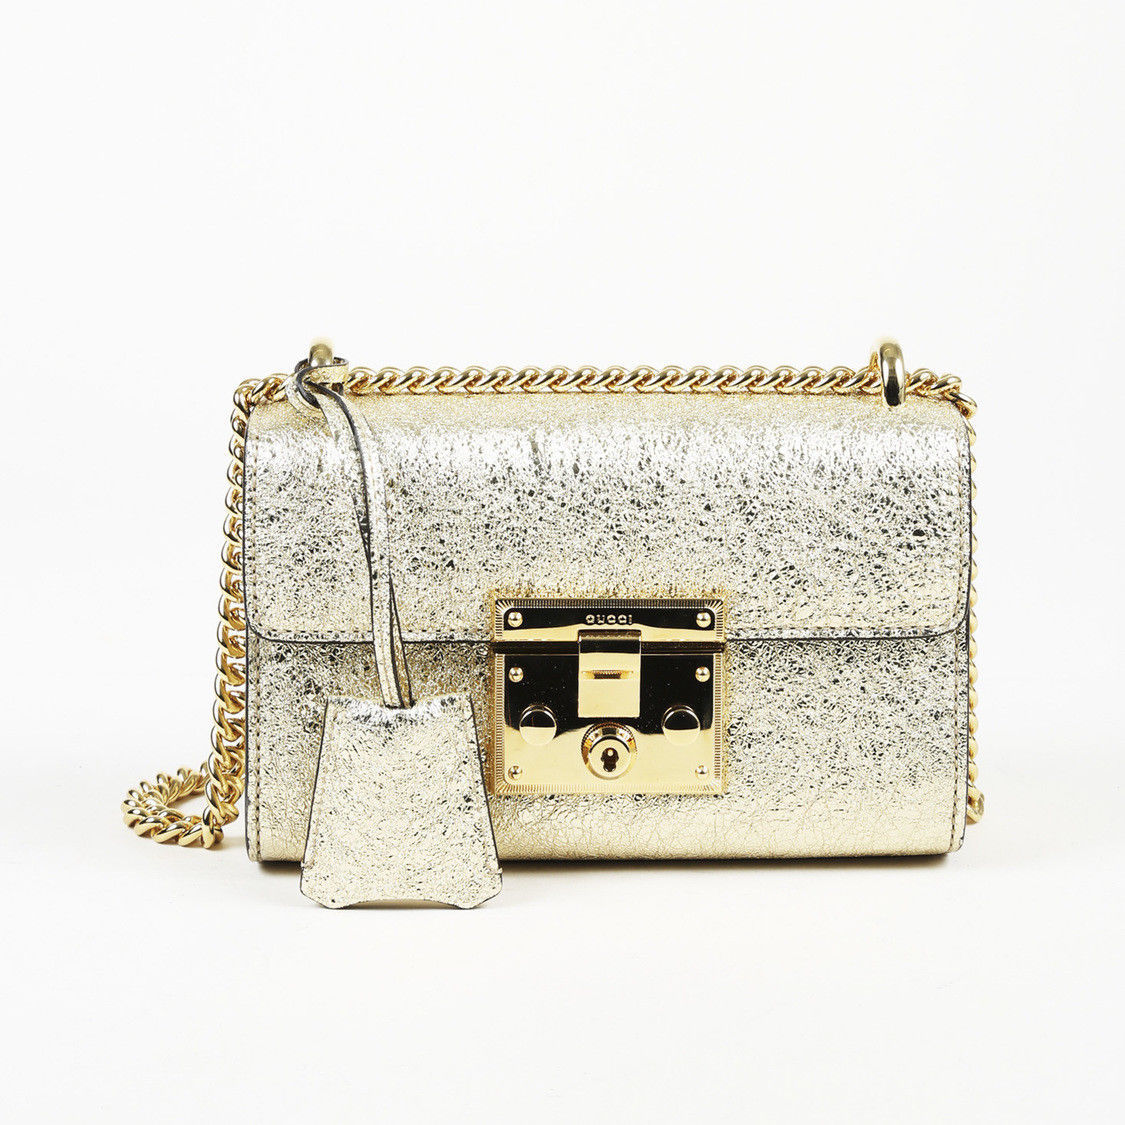 c2372aa3b6d9 Gucci Leather Small Padlock Flap Bag - $1,384.60